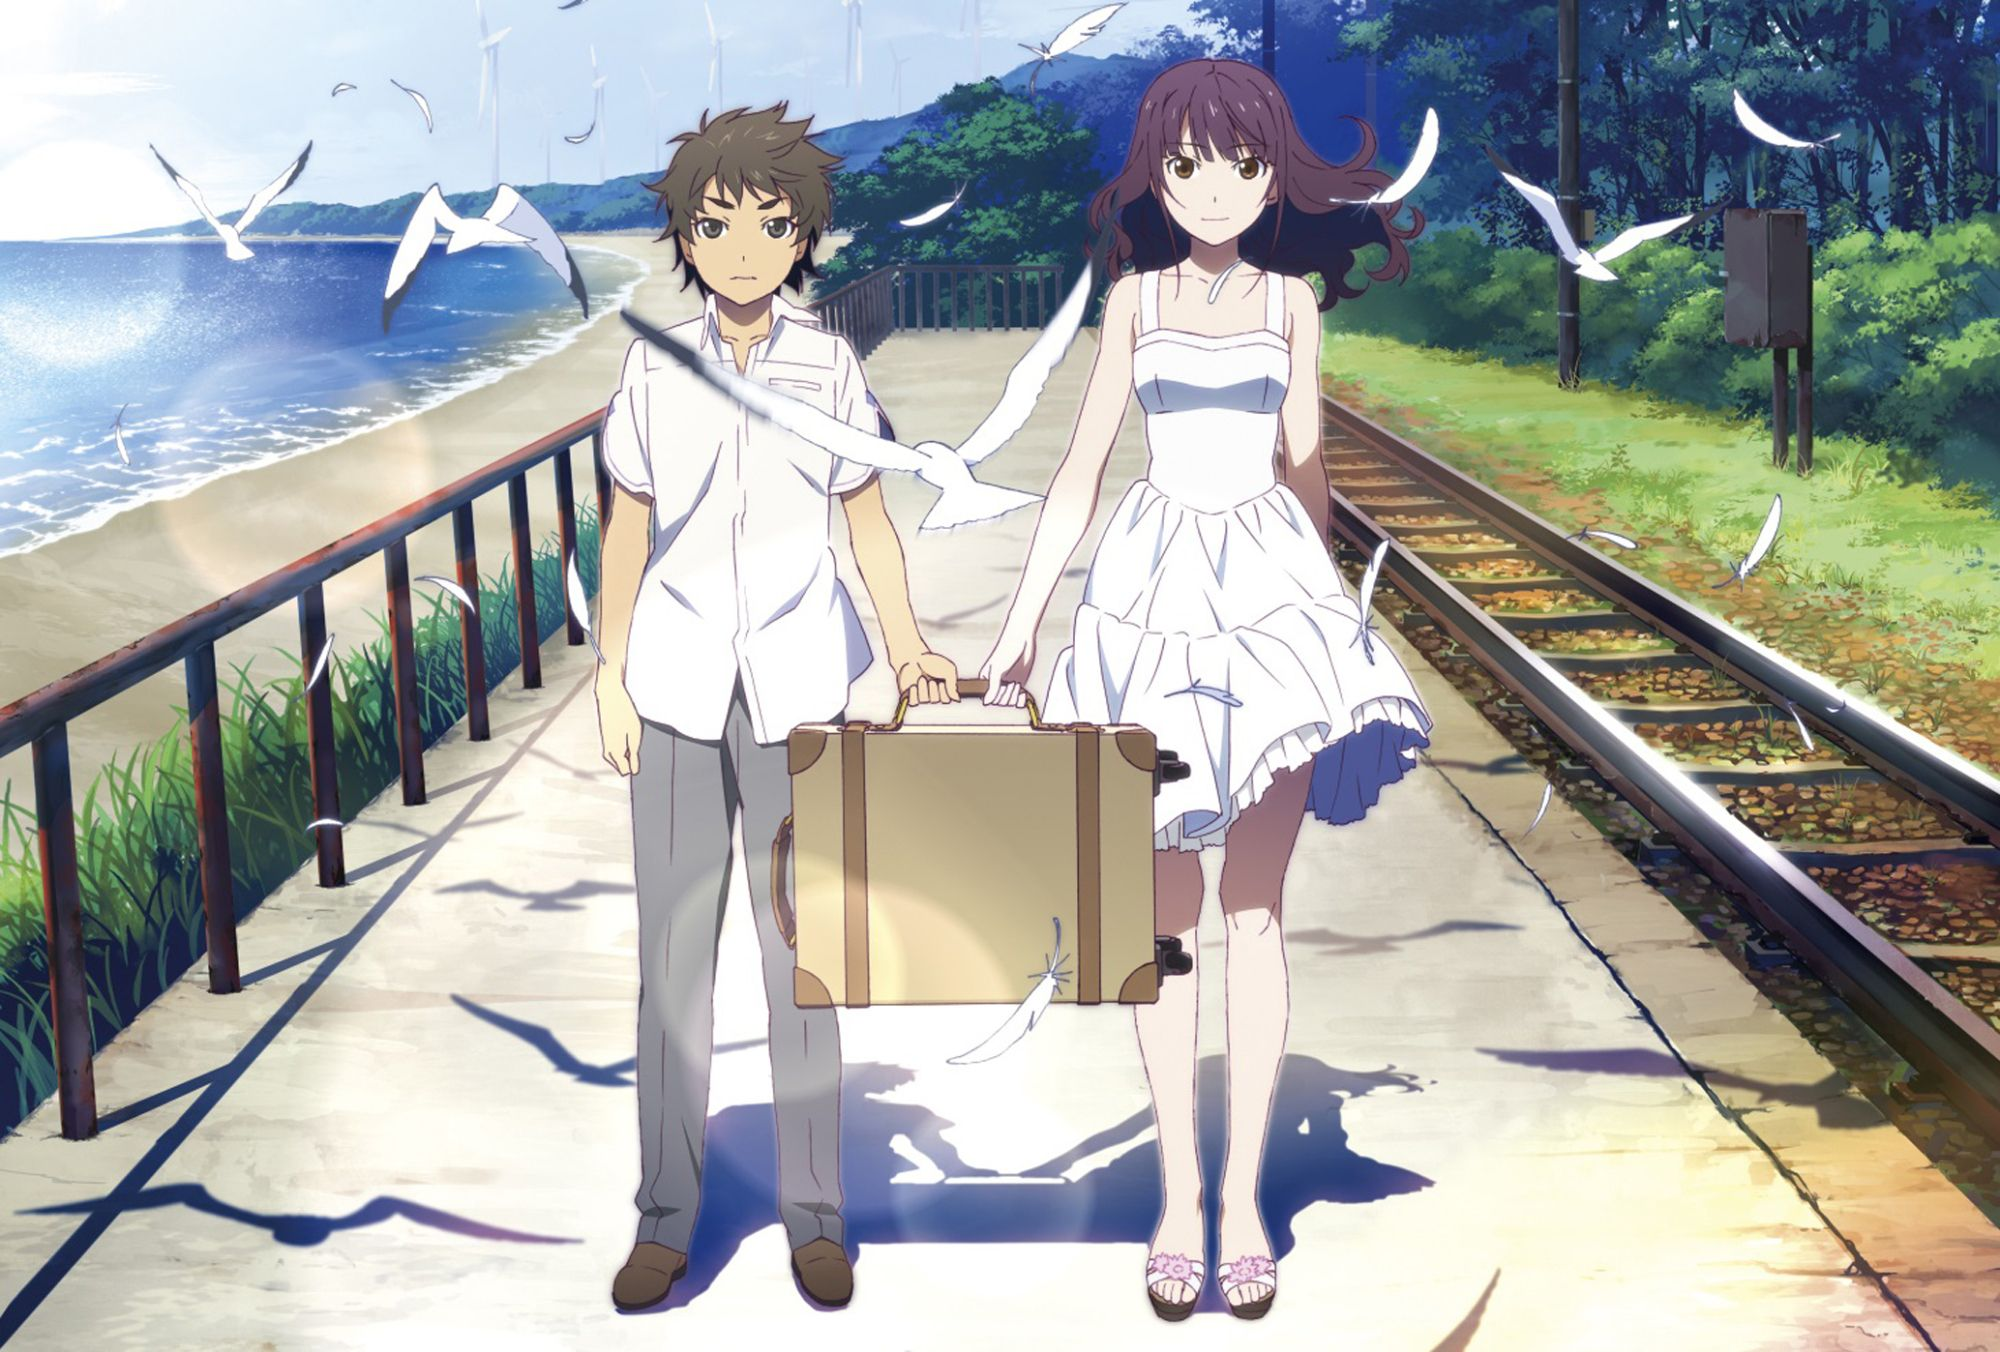 Fireworks Anime Films Anime Best Romance Anime Fireworks anime hd wallpaper